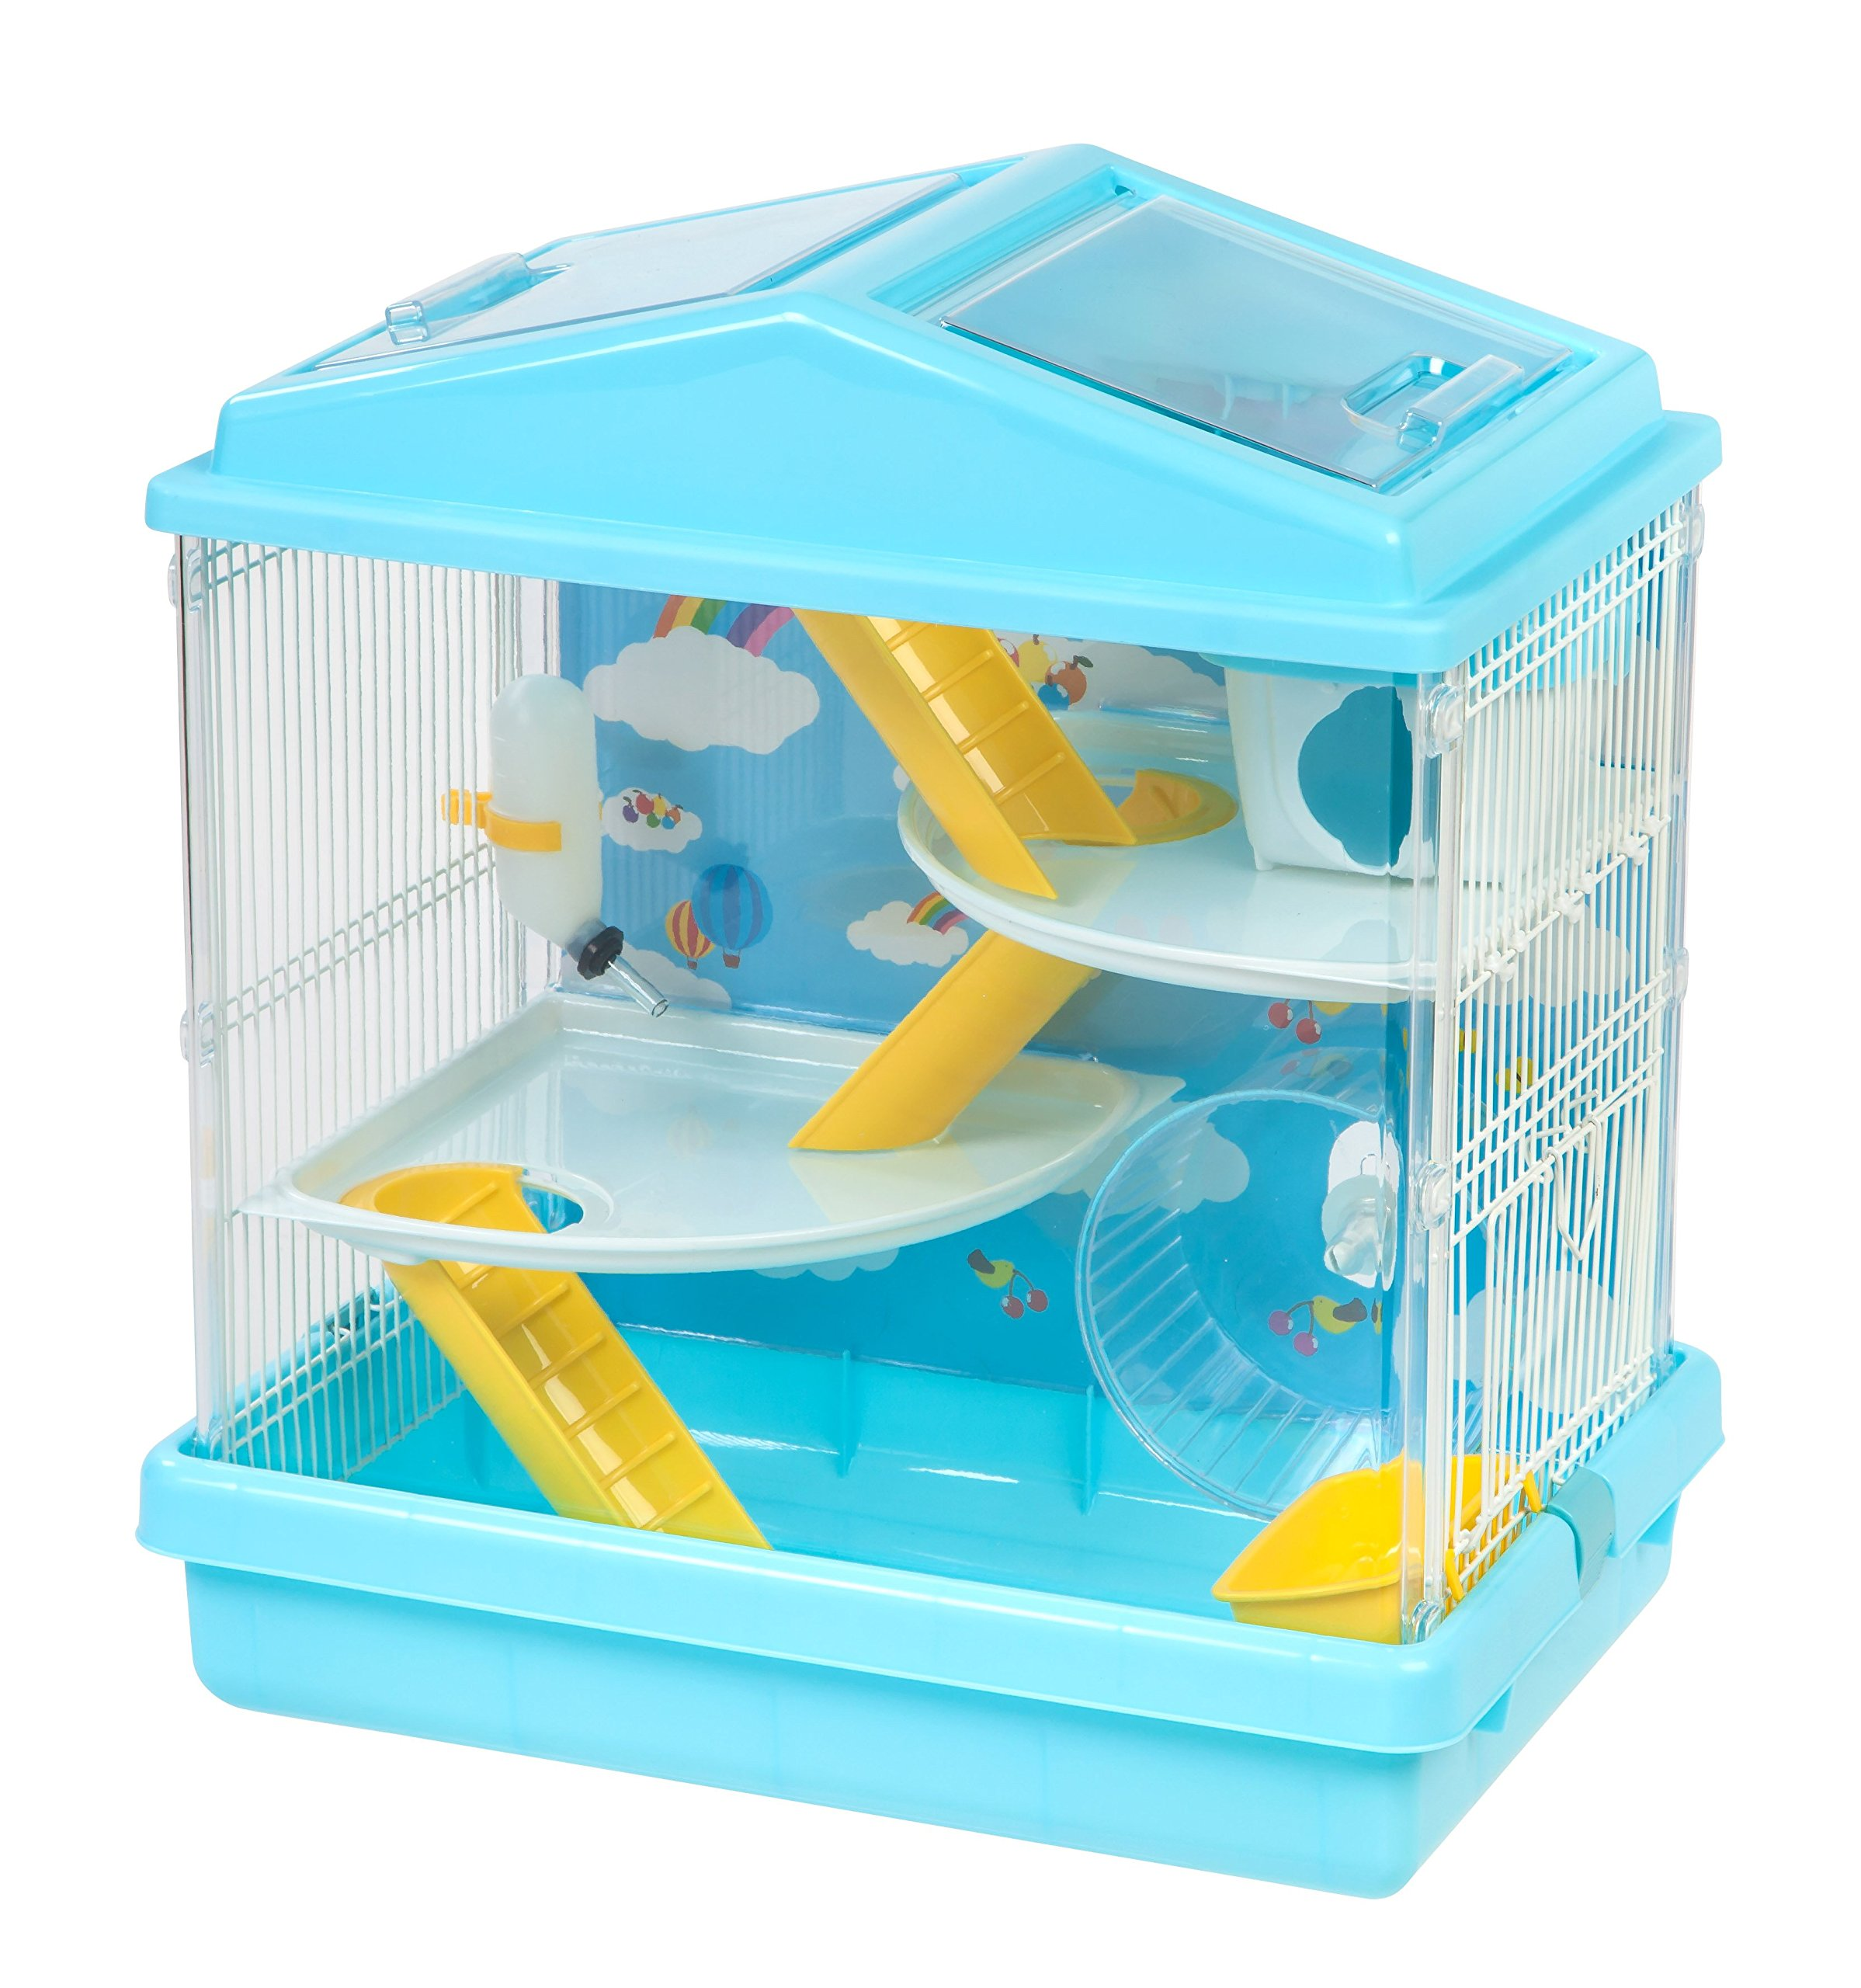 IRIS USA Hamster and Gerbil Pet Cage, 3-Tier, Blue